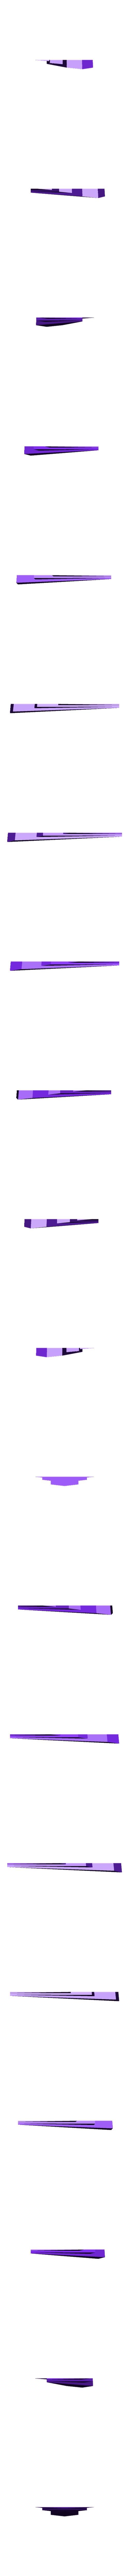 Deco.stl Download free SCAD file Perpetual Flip Calendar (W/ Customizable Font) • 3D printable model, Dsk